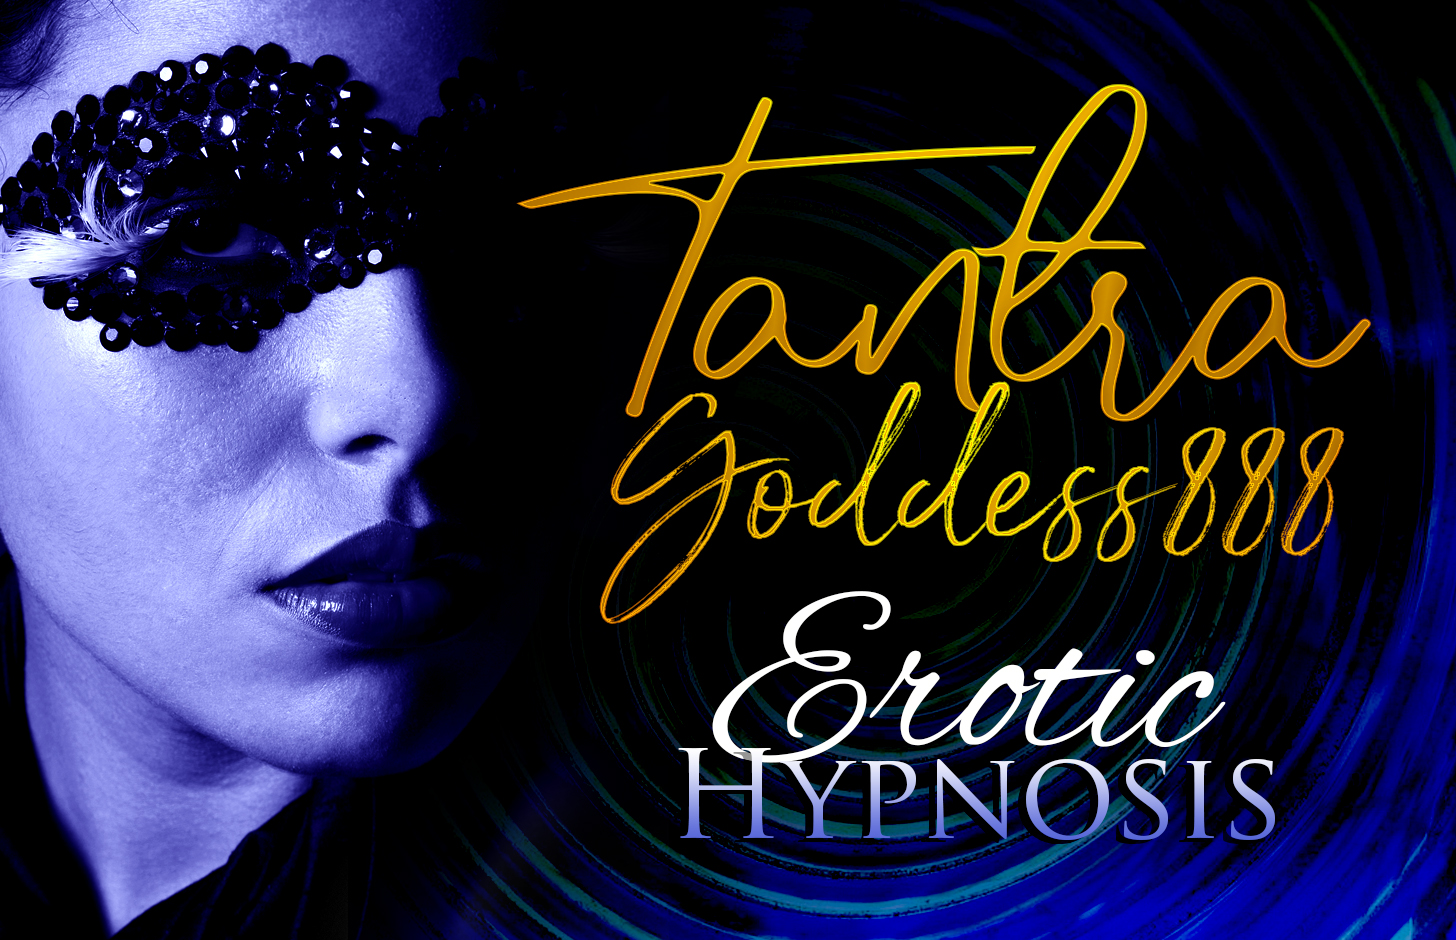 Tantragoddess888 Erotic Hypnosis